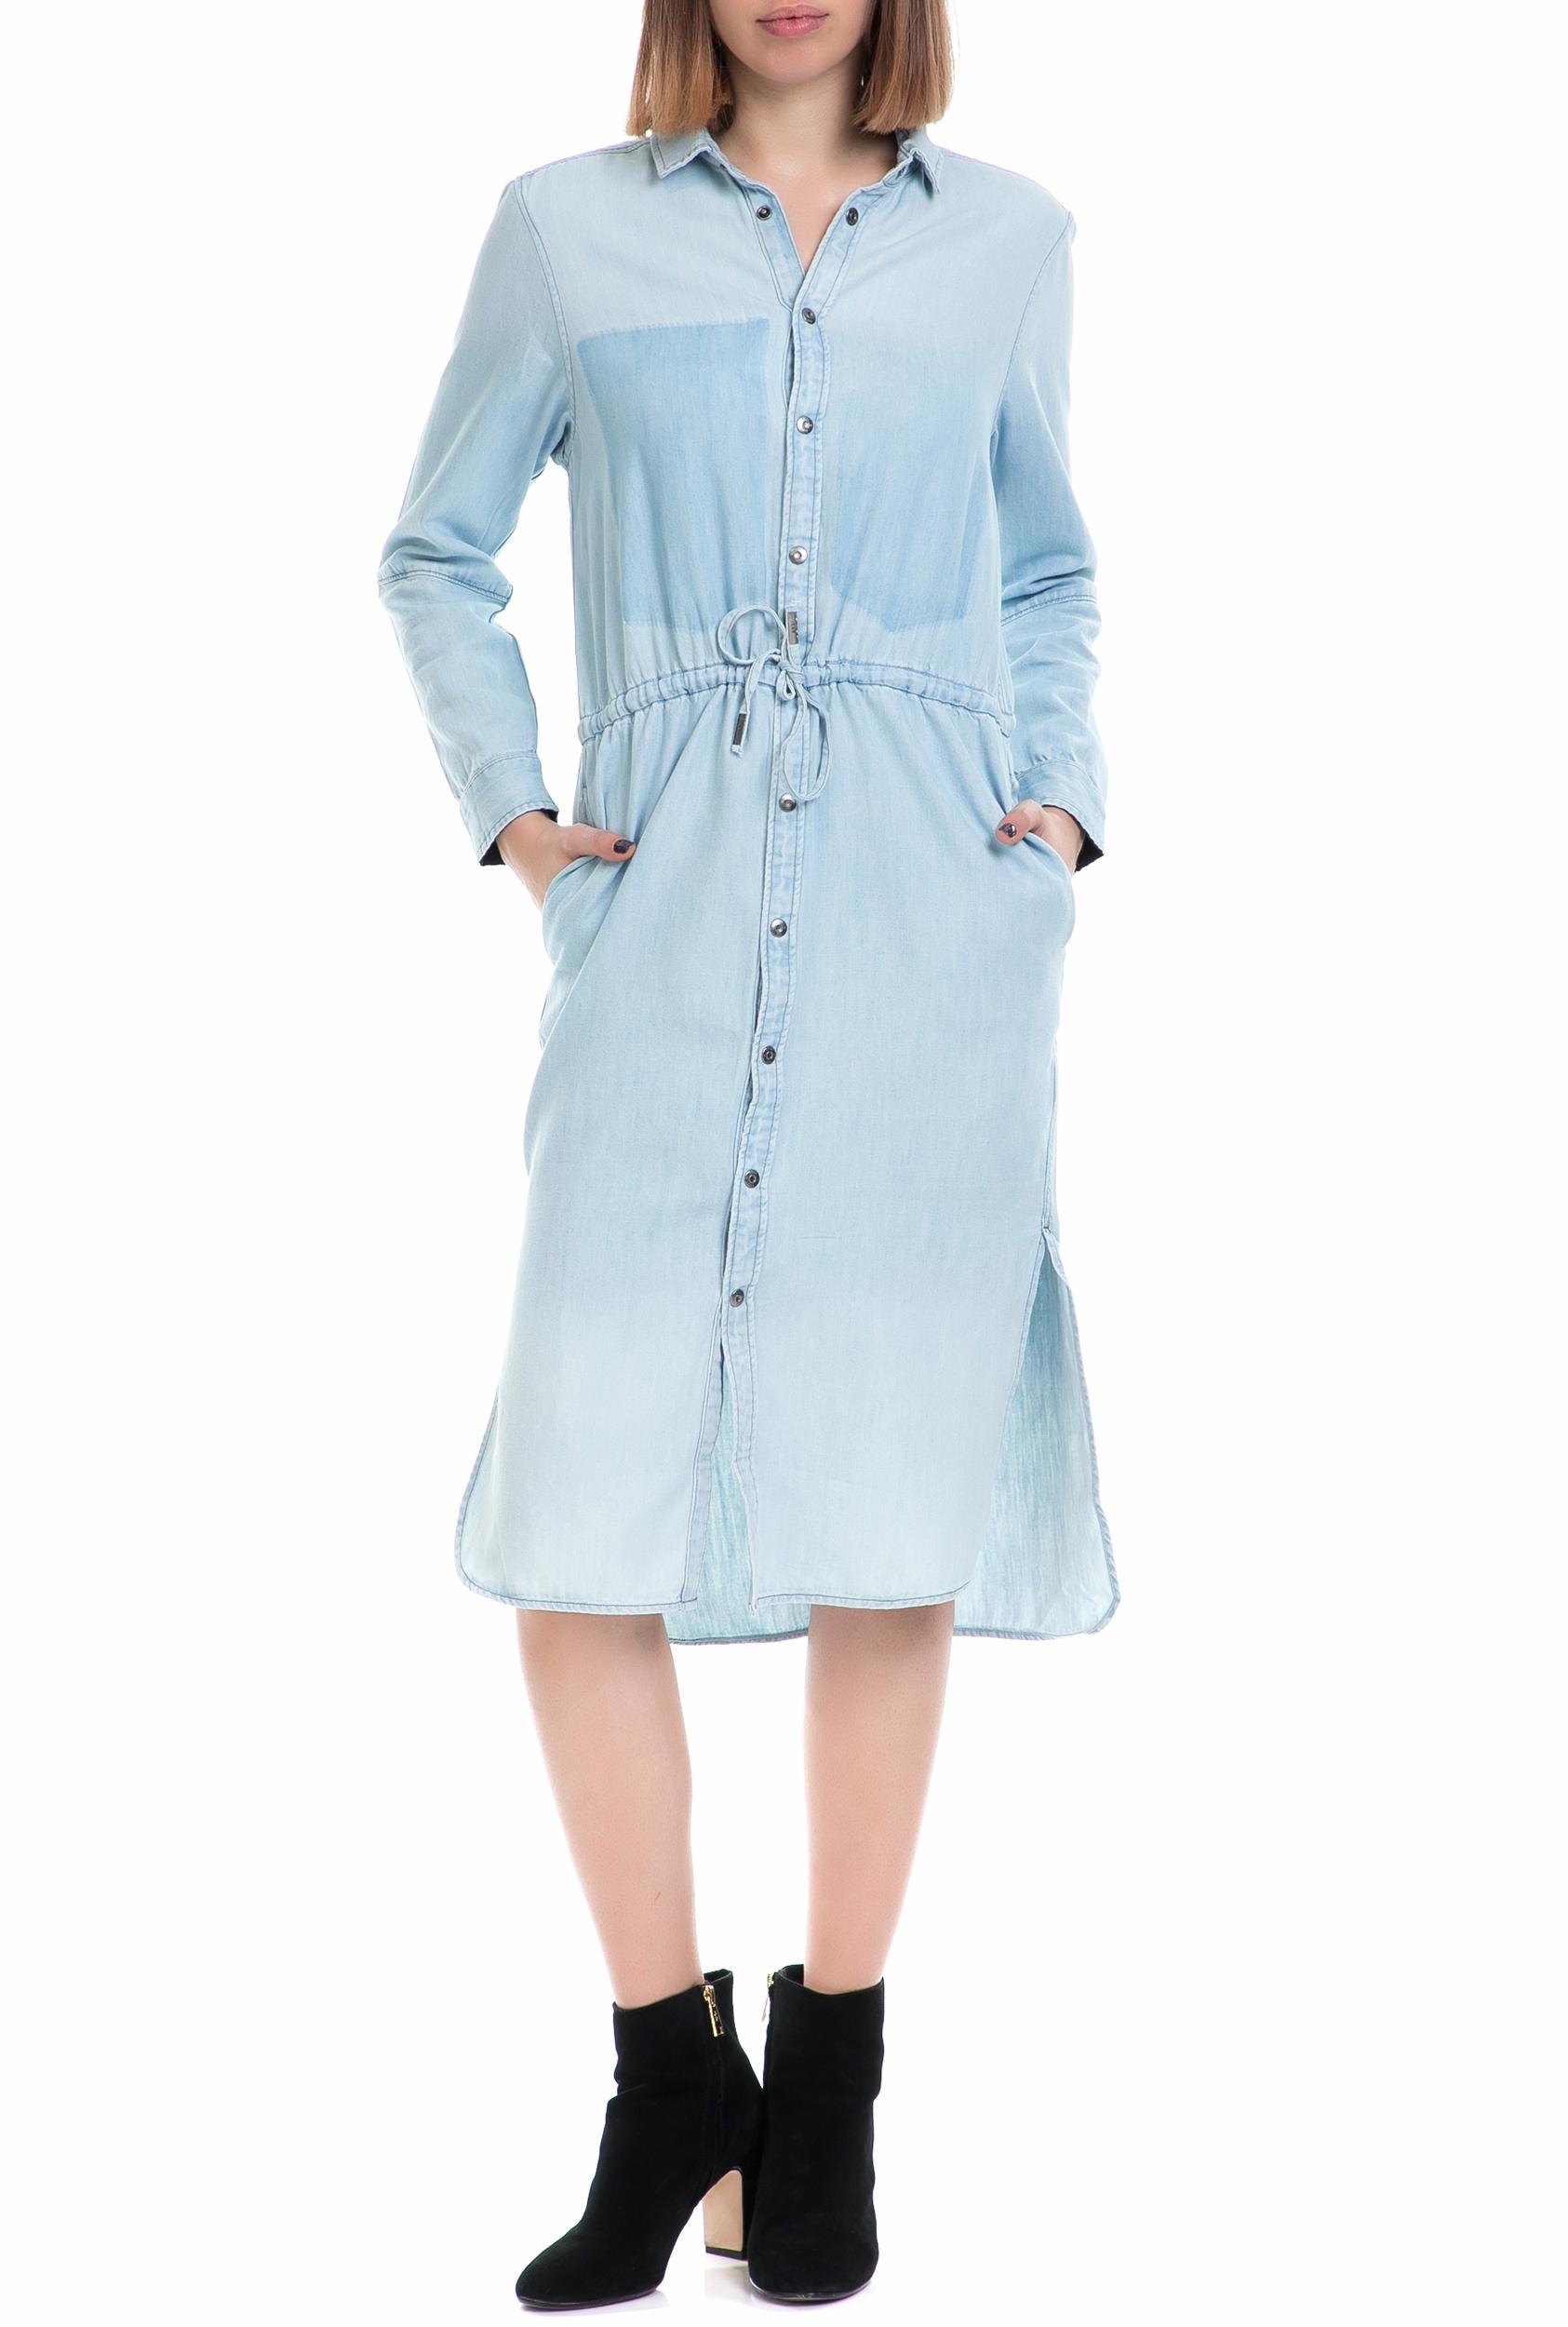 G-STAR RAW - Γυναικείο τζιν φόρεμα Modern Arc 3D G-STAR μπλε γυναικεία ρούχα φορέματα μέχρι το γόνατο